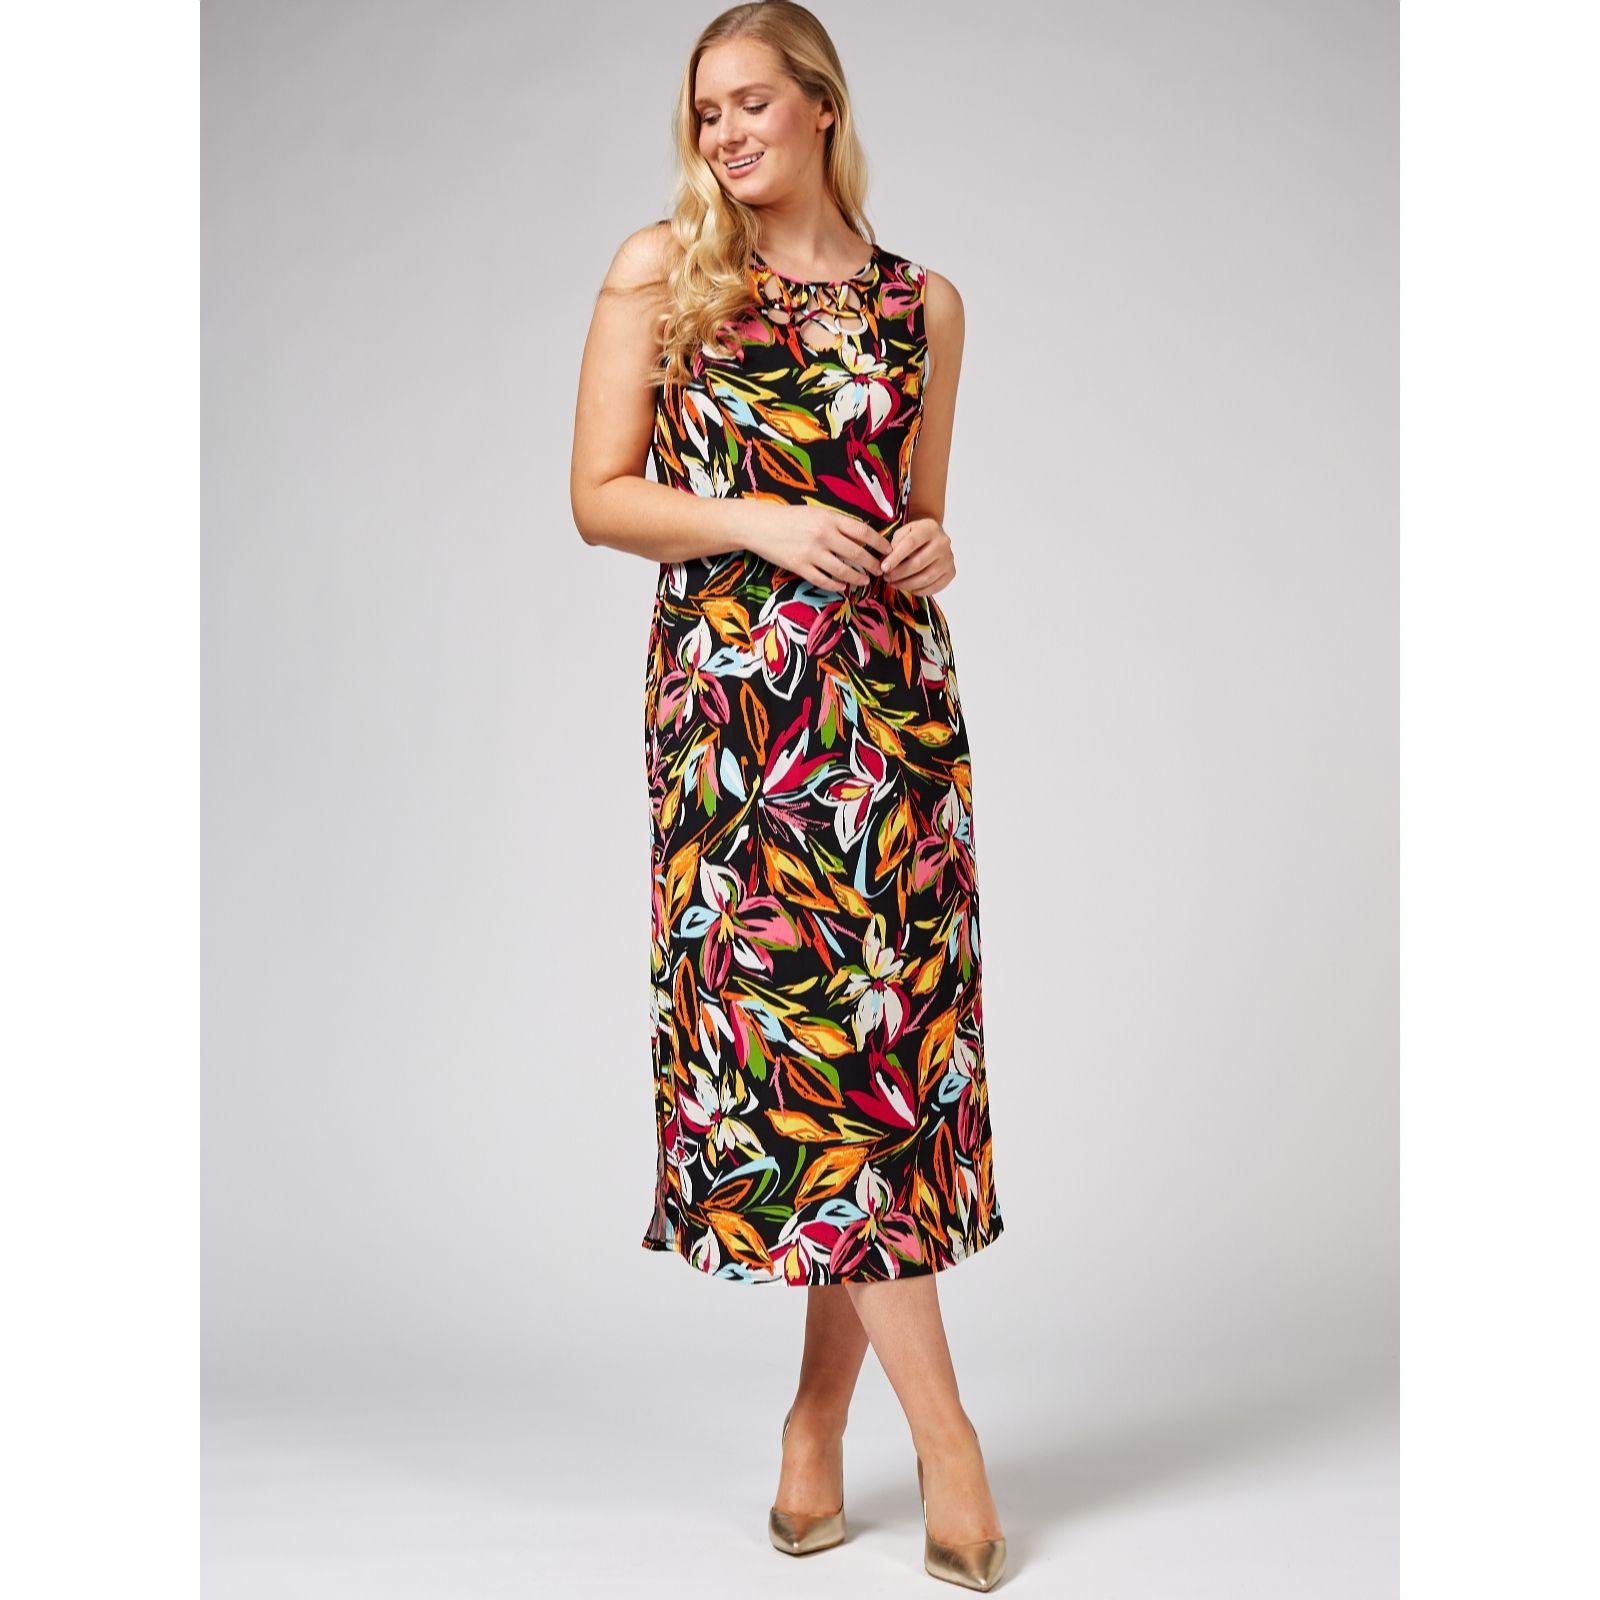 548b3da6bfe Coco Bianco Round Neck Printed Maxi Dress Regular - QVC UK